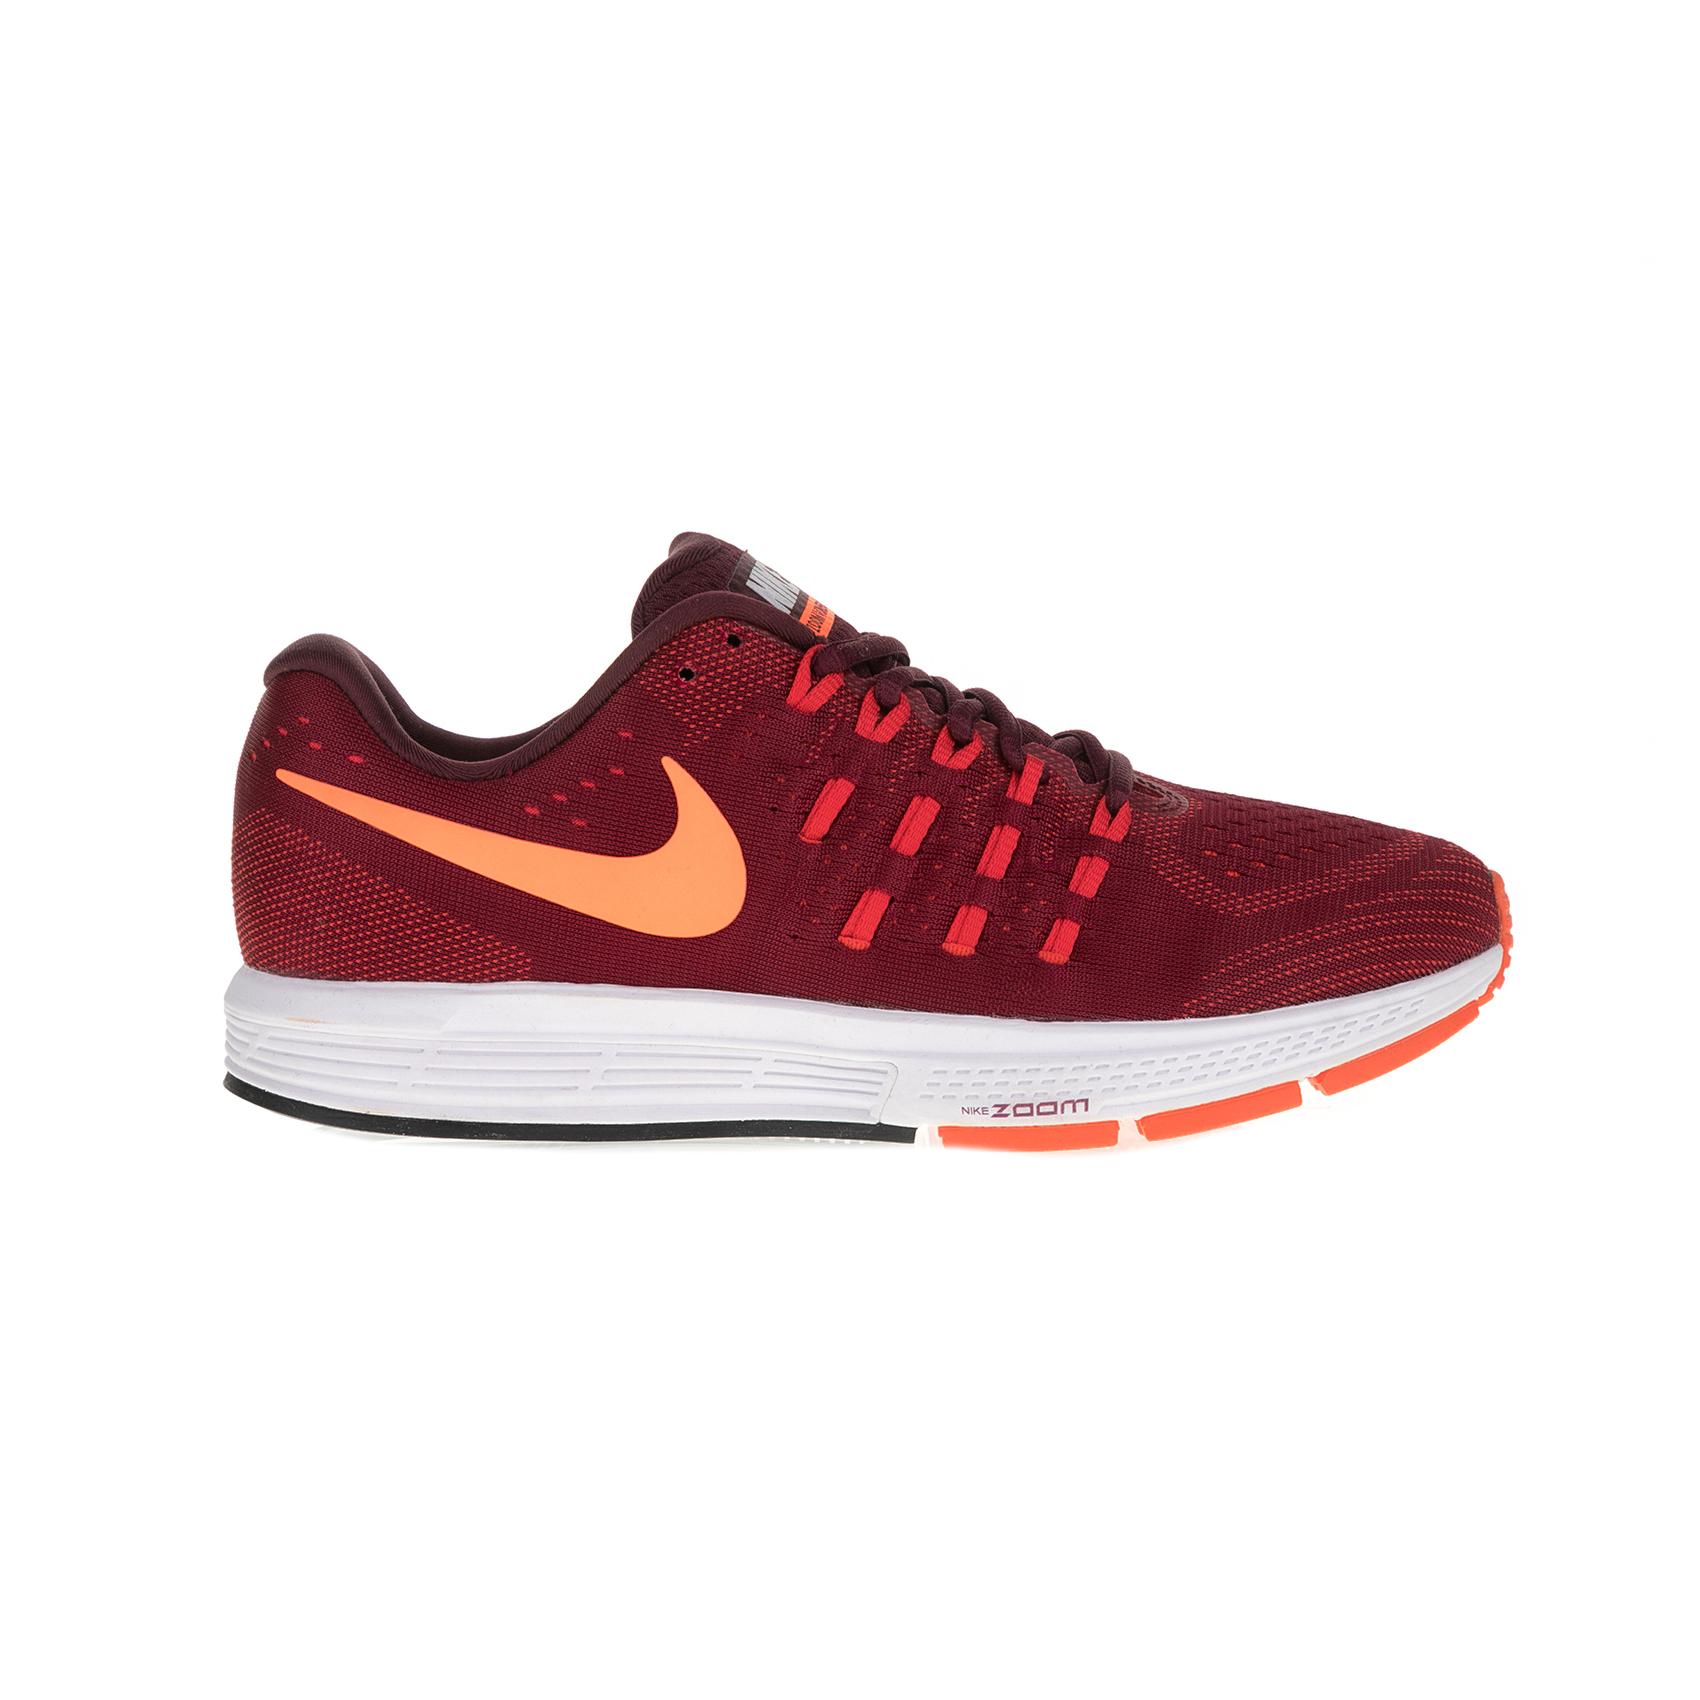 NIKE – Ανδρικά αθλητικά παπούτσια Nike AIR ZOOM VOMERO 11 κόκκινα